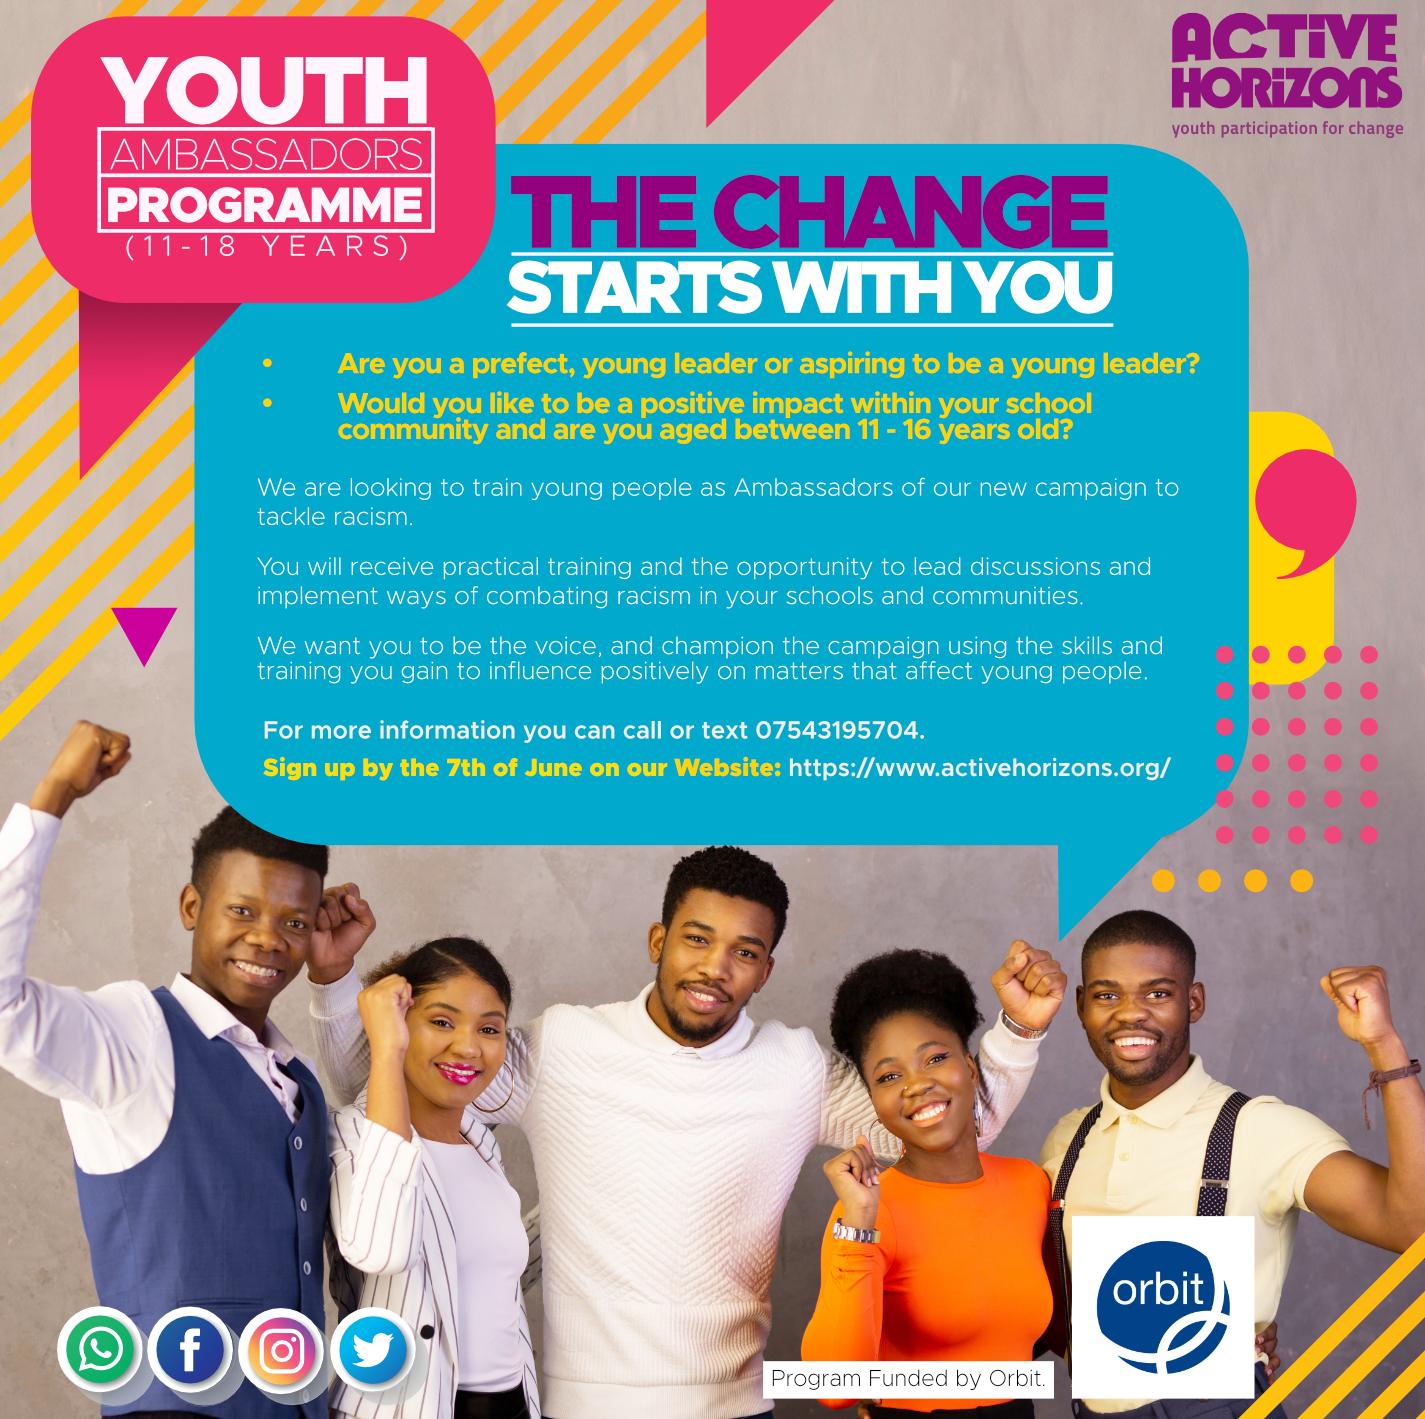 Youth Ambassadors Programme- Tackling Racism